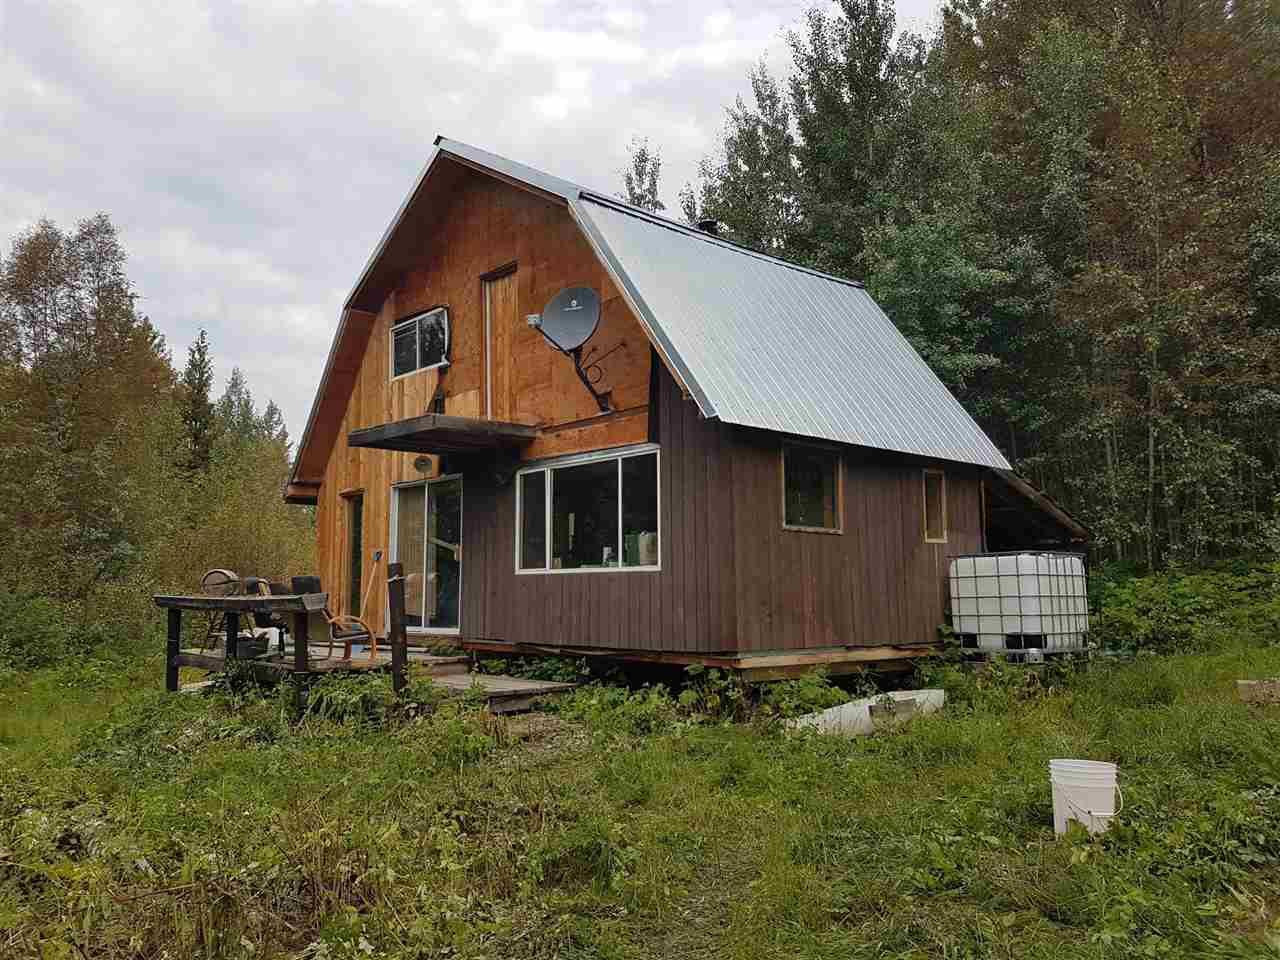 Main Photo: 7615 READ Road in Valemount: Valemount - Rural West House for sale (Robson Valley (Zone 81))  : MLS®# R2440556